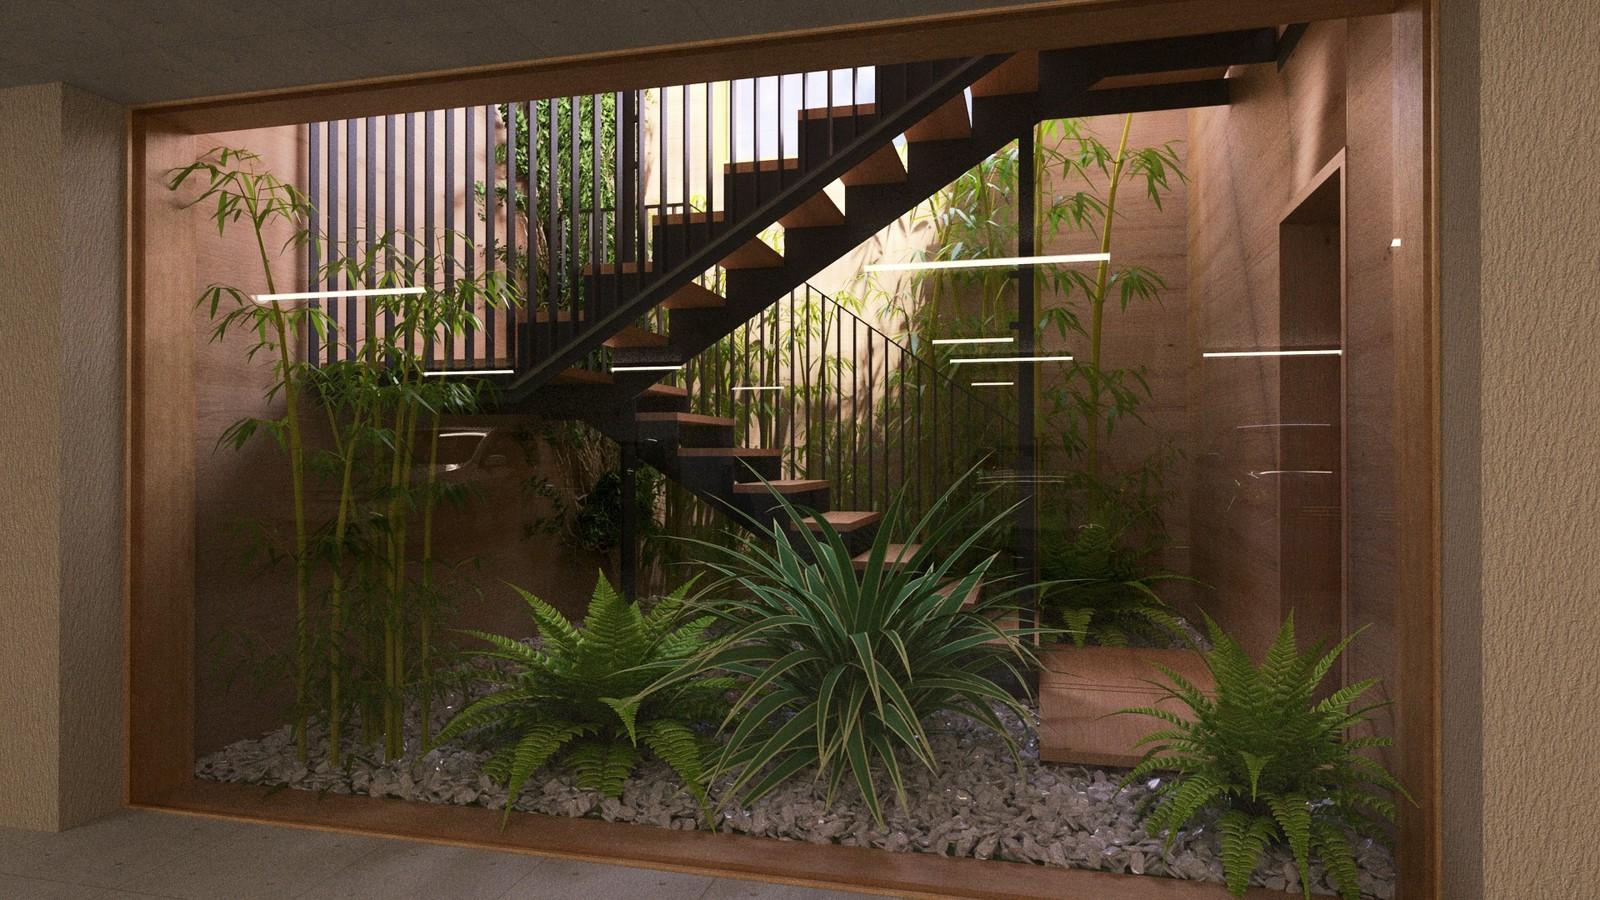 25 A1309-Villas Portier 3d STAIRCASE-GARAGE-Garage Bottom stairwell b2 Post 02  KP webpage of project: http://www.kemppro.com/KP_3D_communication_3_Villas_Veyrier.html